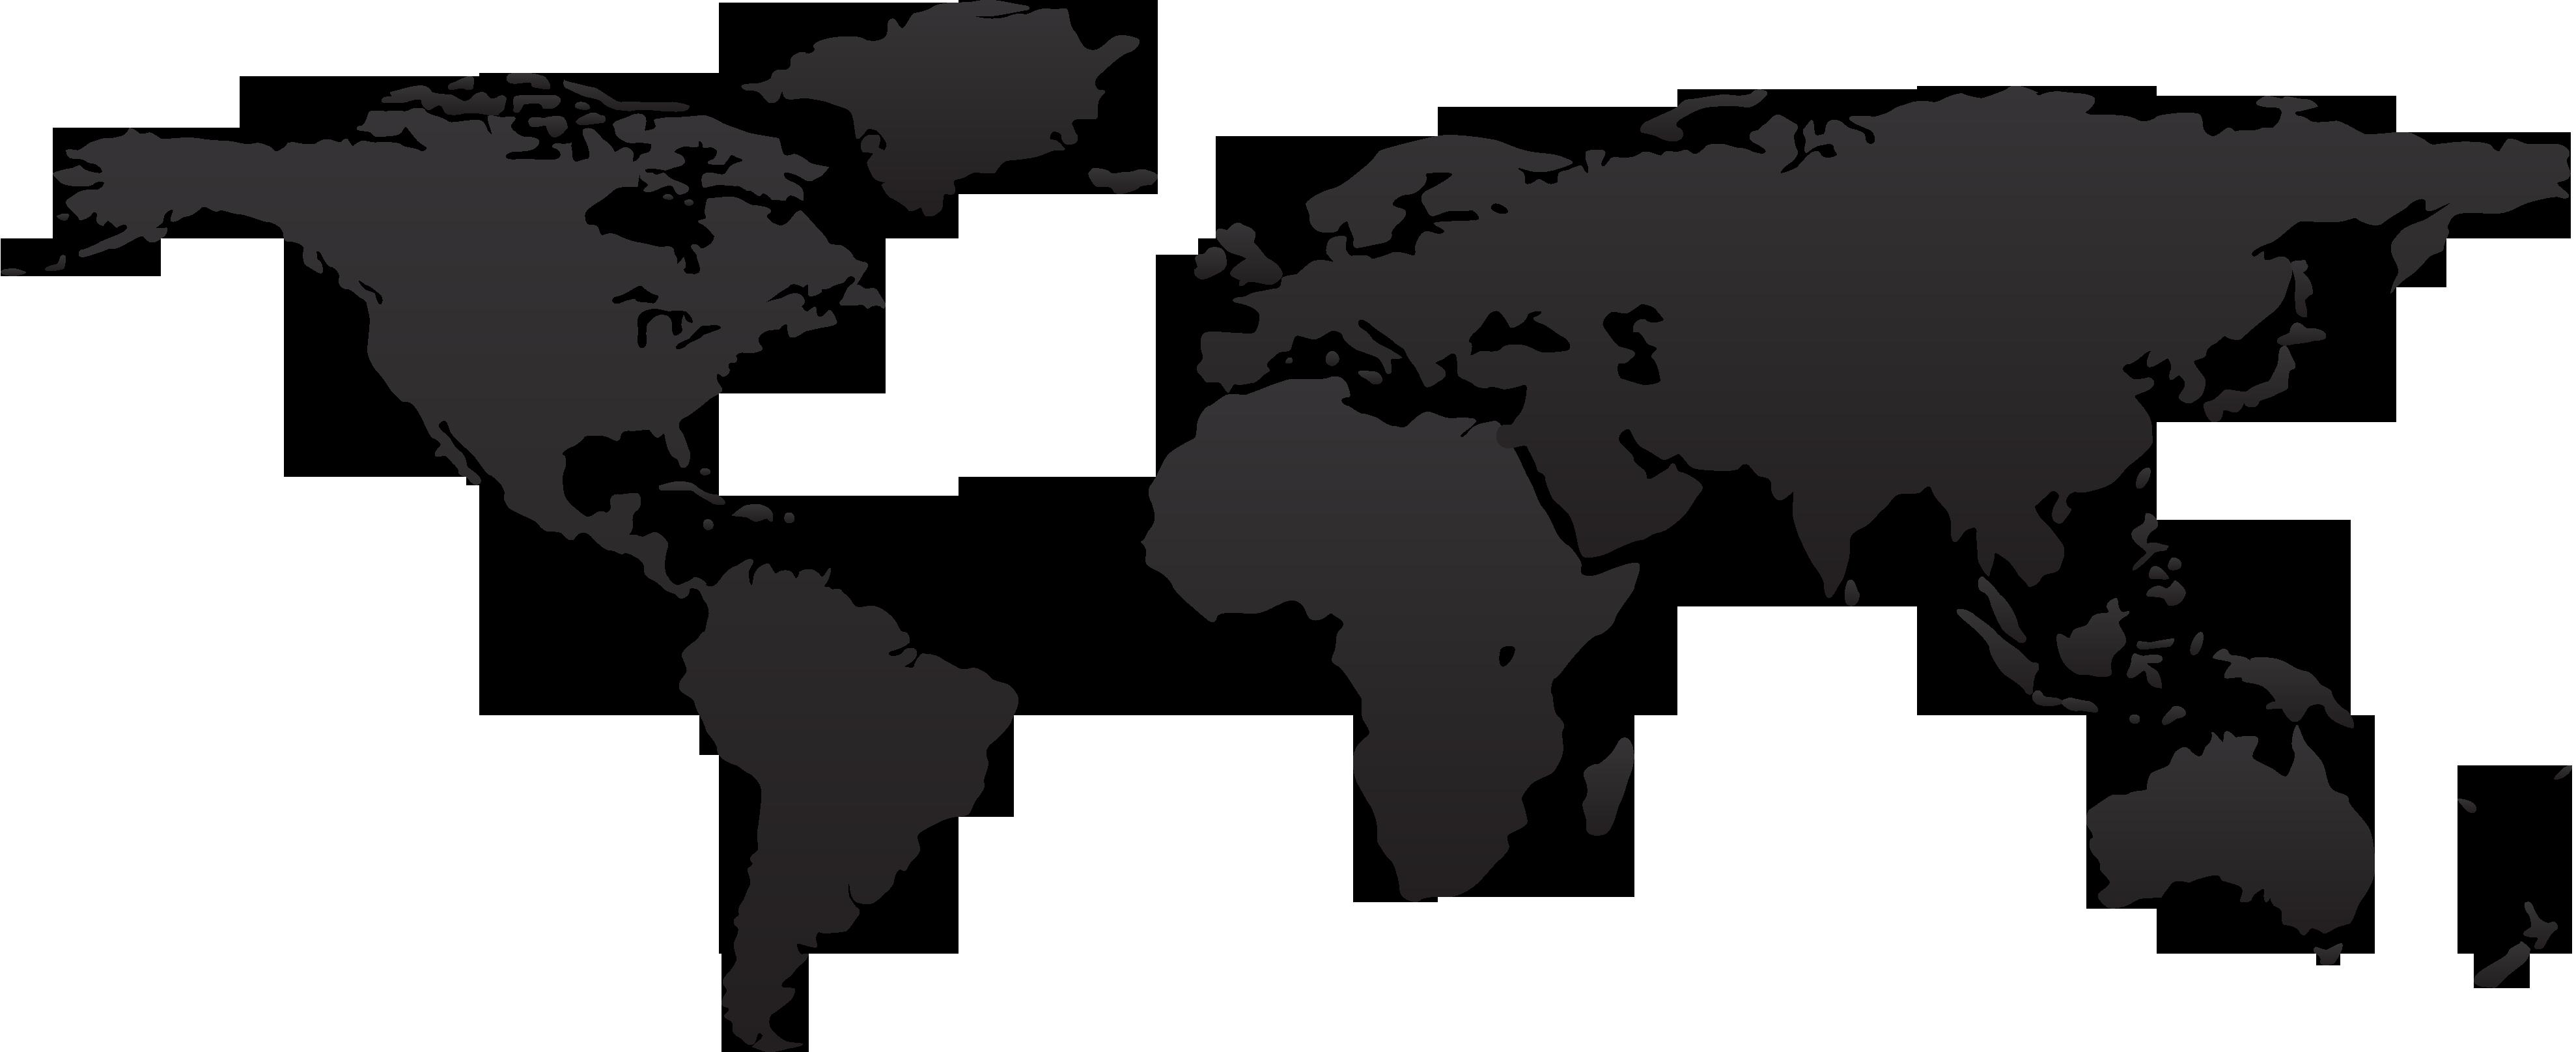 Humungour PNG Flat World Map Juice Cartinepng - World map flat